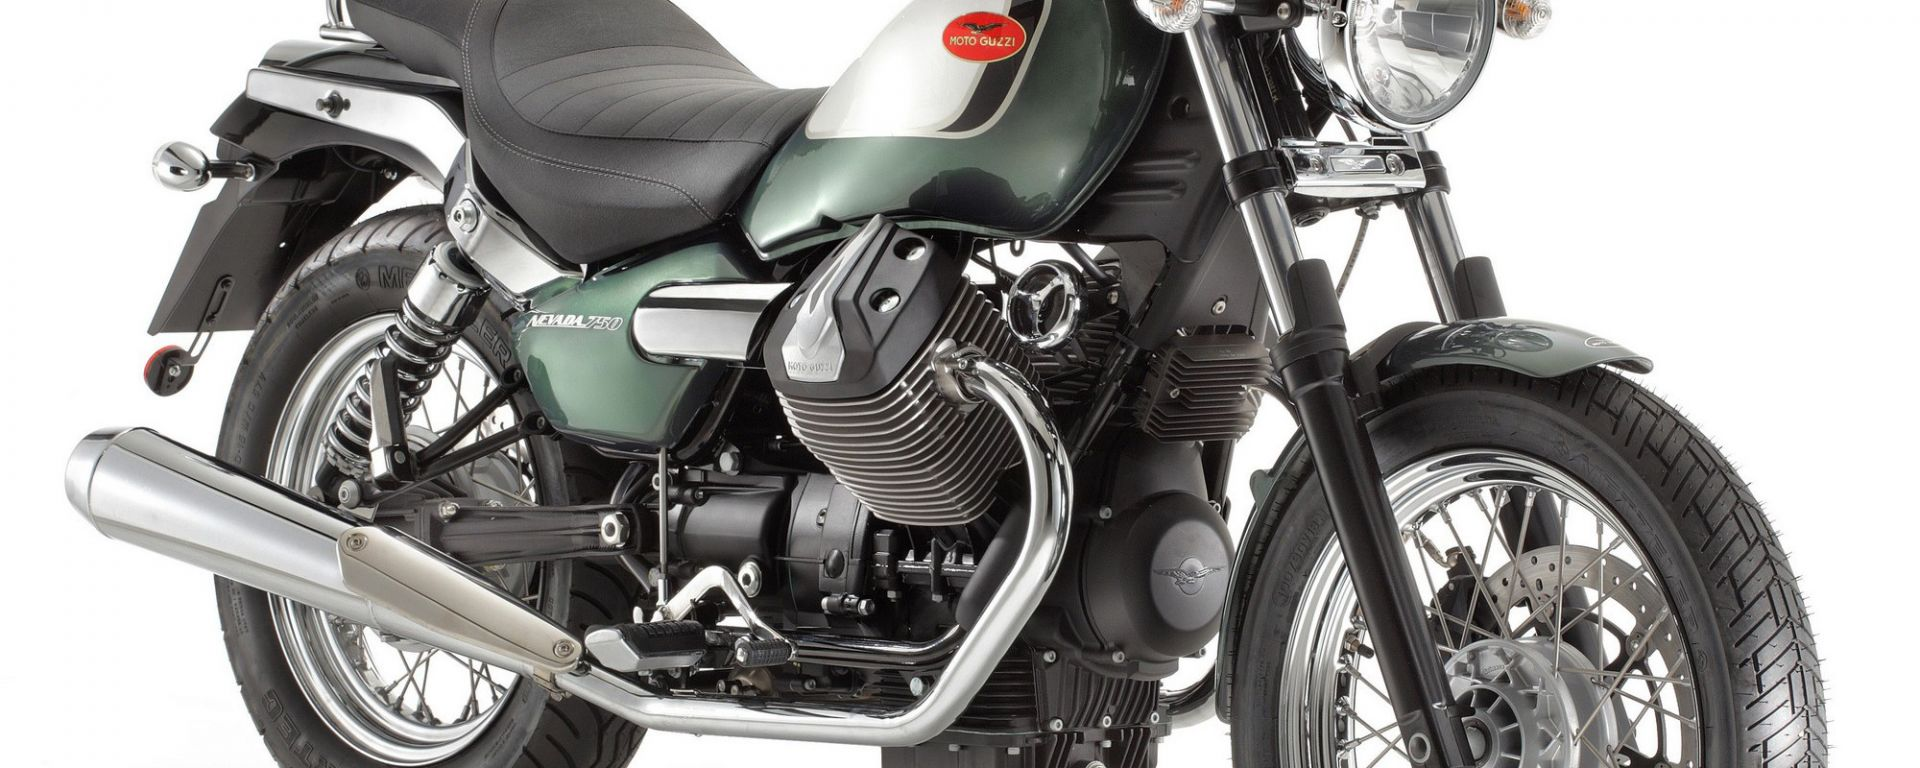 Moto Guzzi Nevada 2012